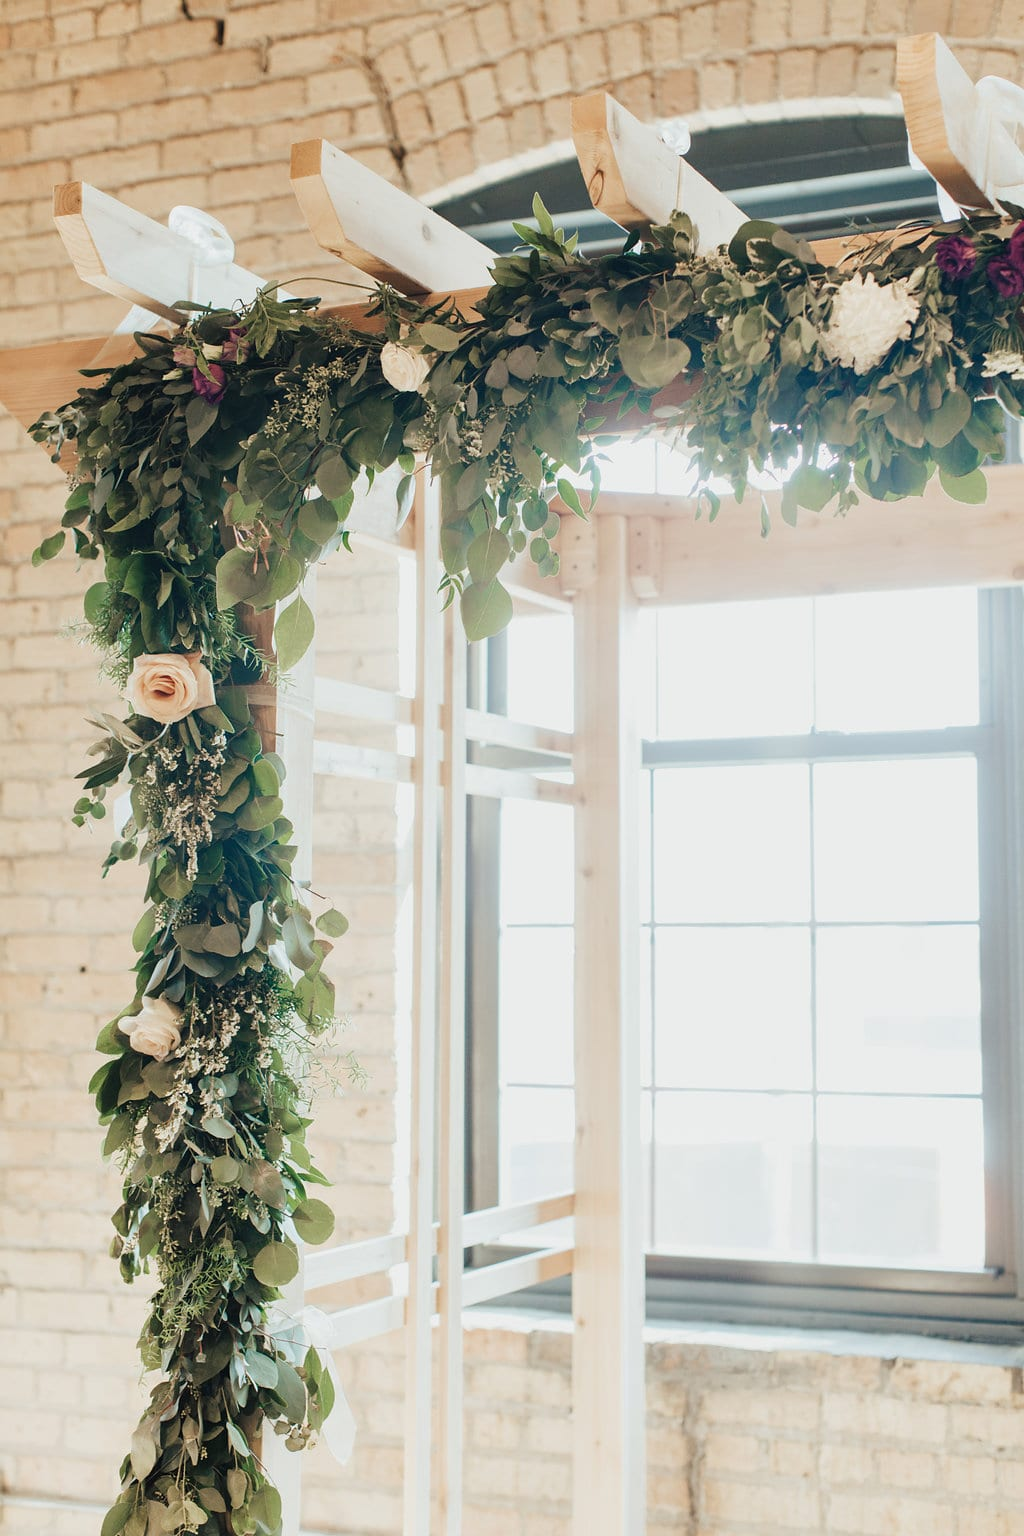 Solar Arts Building, fall flowers, winter flowers, indoor wedding, Minneapolis wedding, wedding flowers, wedding floral, Artemisia Studios, Minneapolis wedding florist, Minnesota wedding florist, floral decor